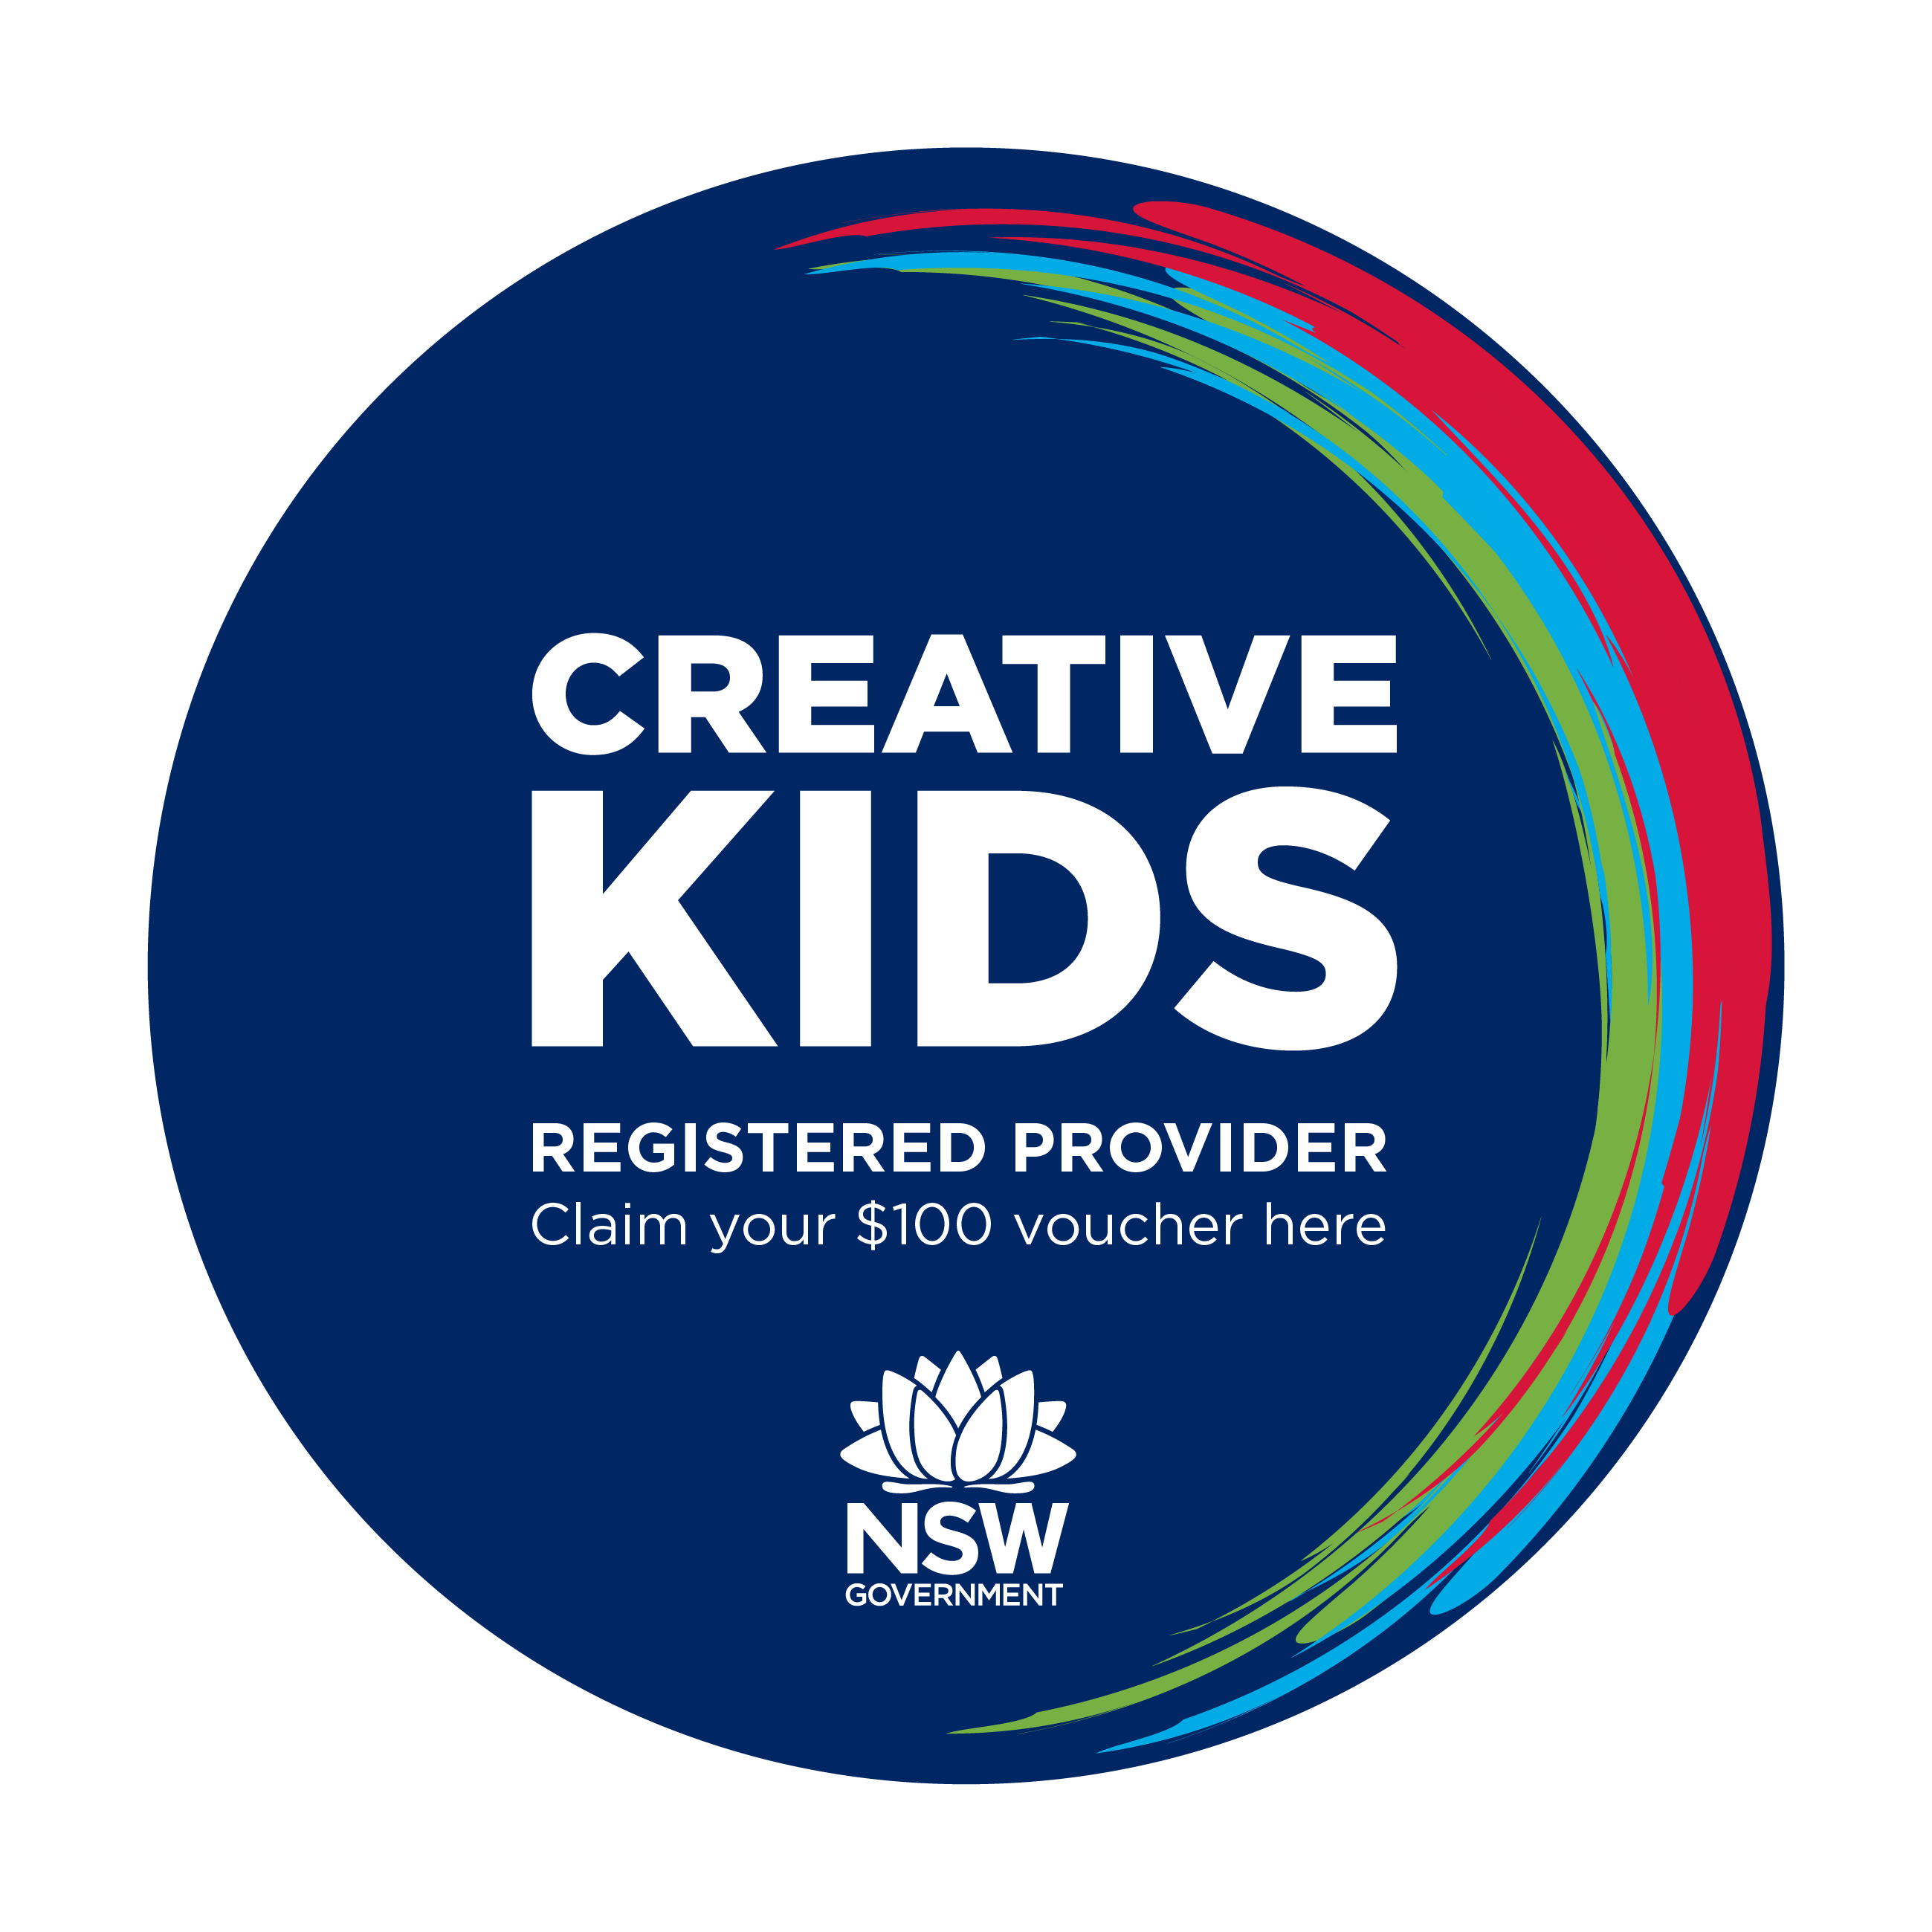 Creative Kids logo - registered provider, claim your $100 voucher here